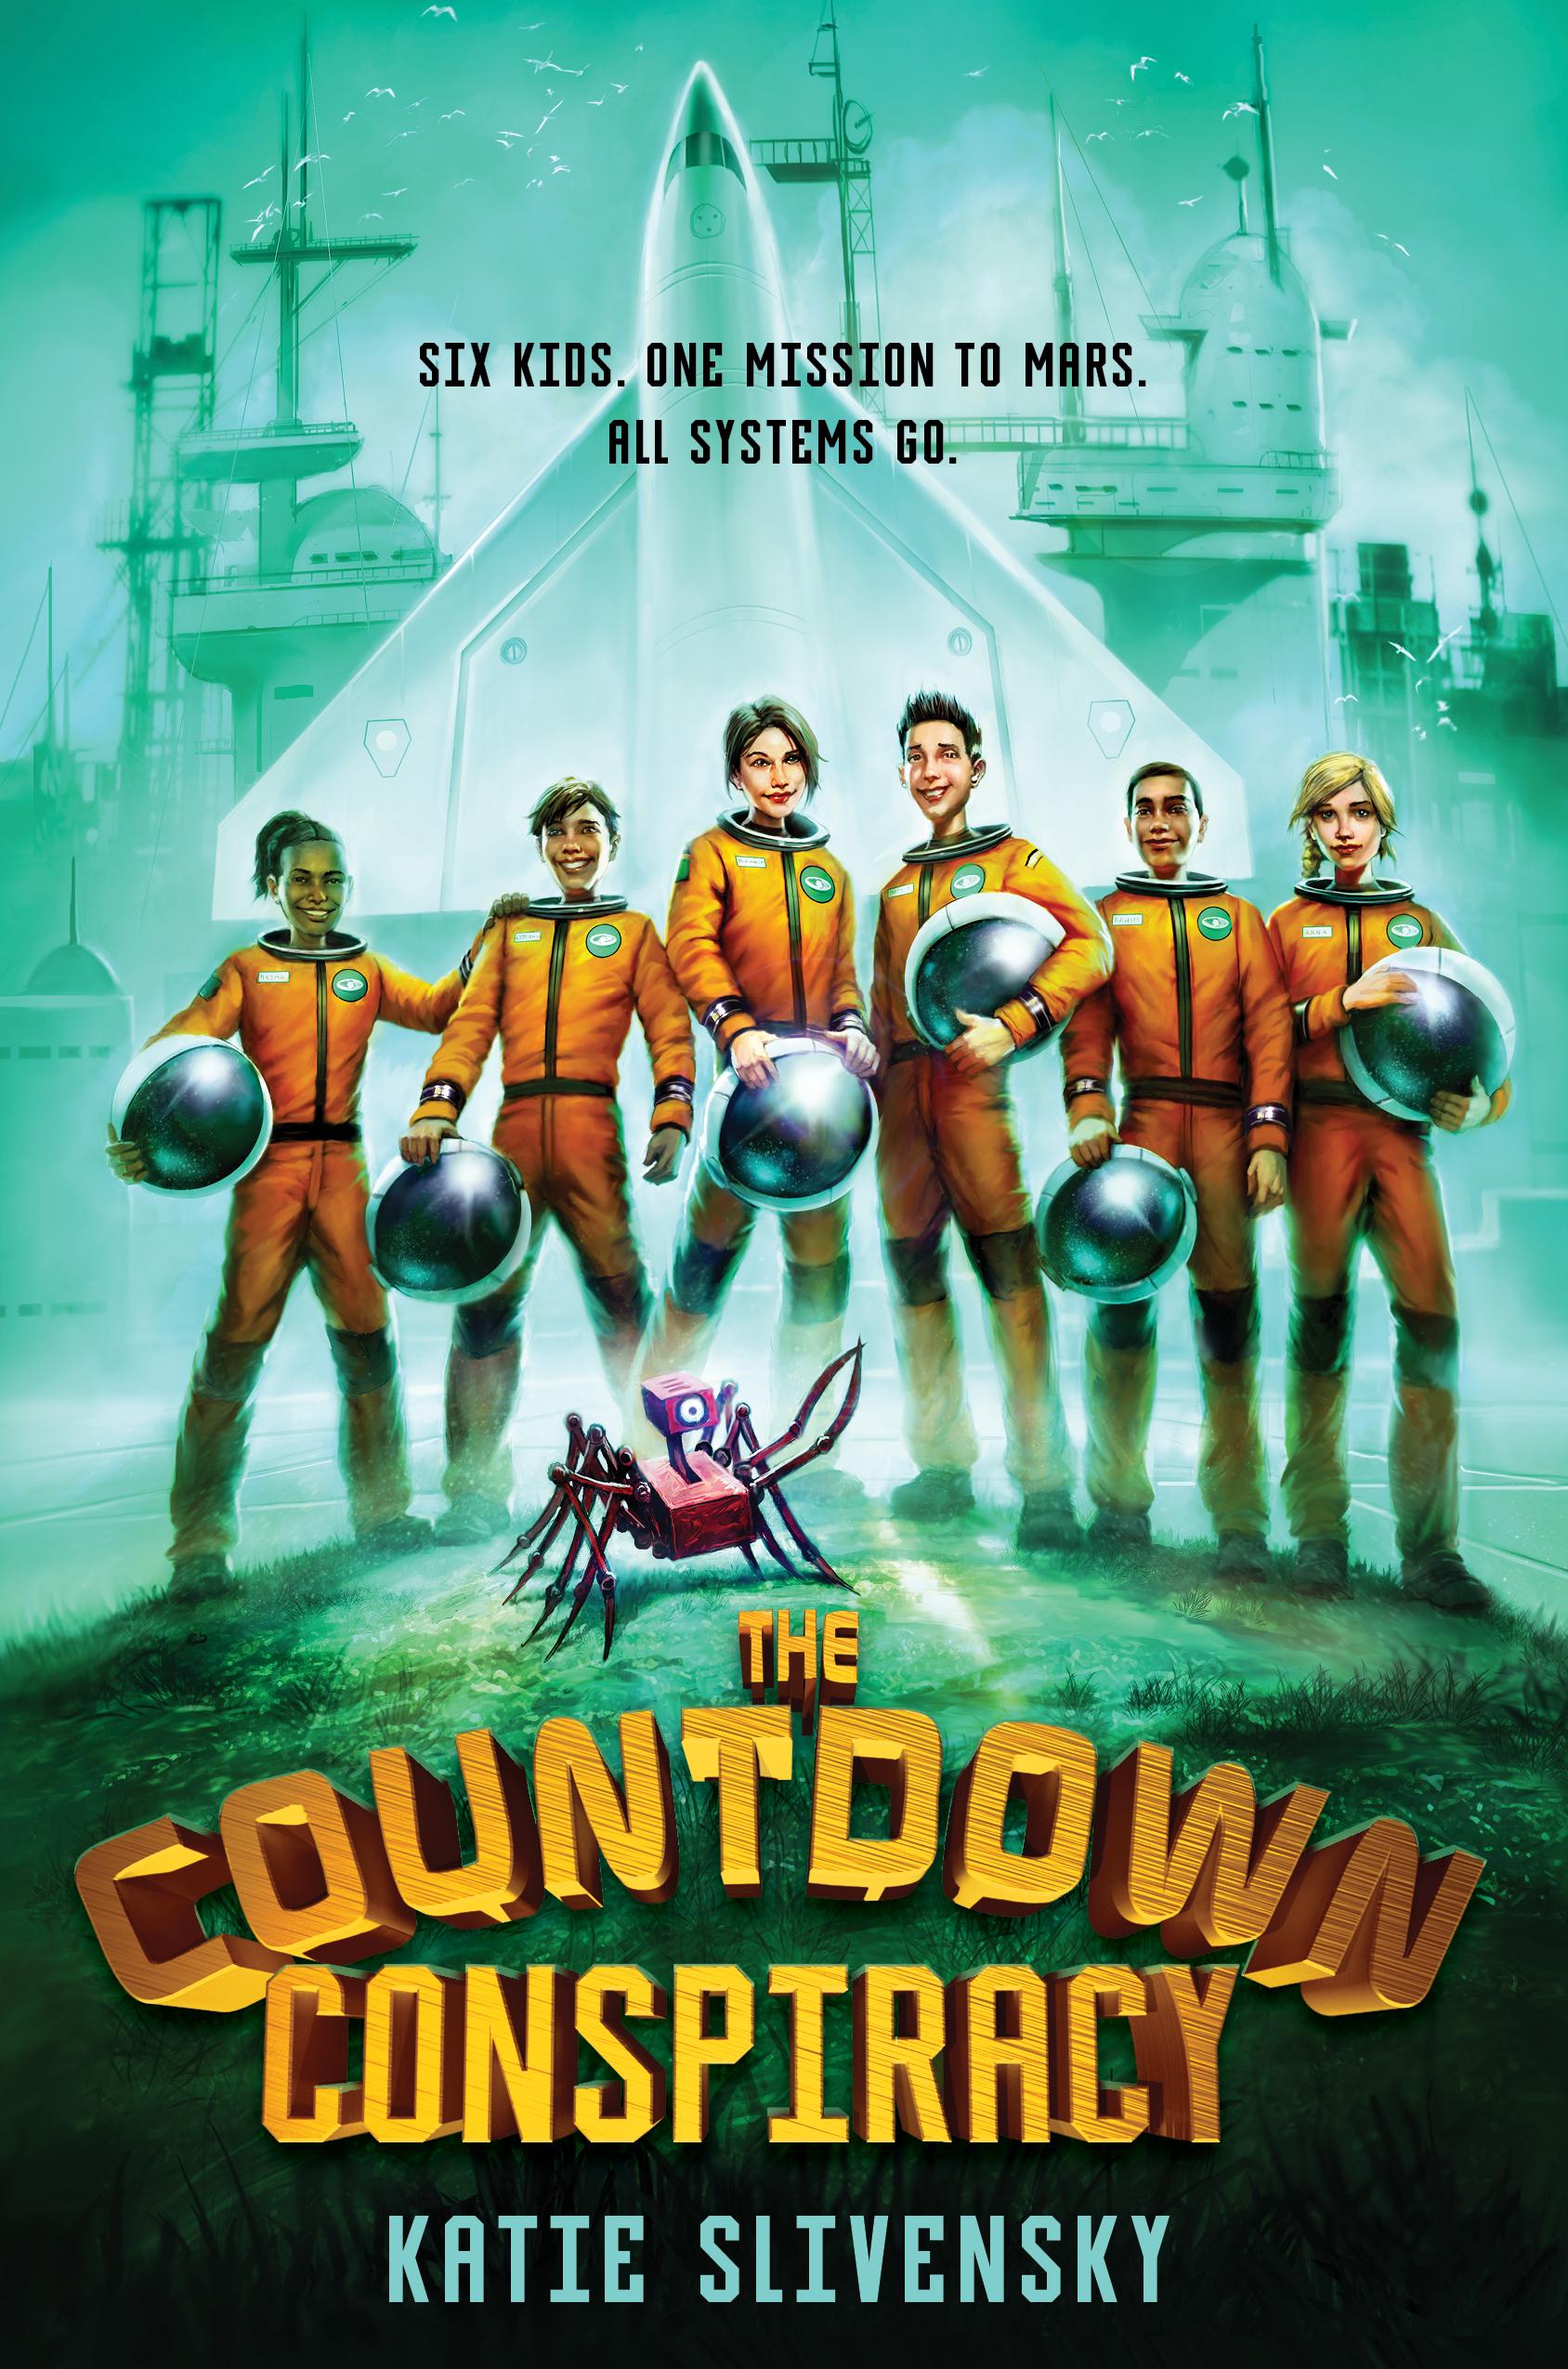 CountdownConspiracy hc